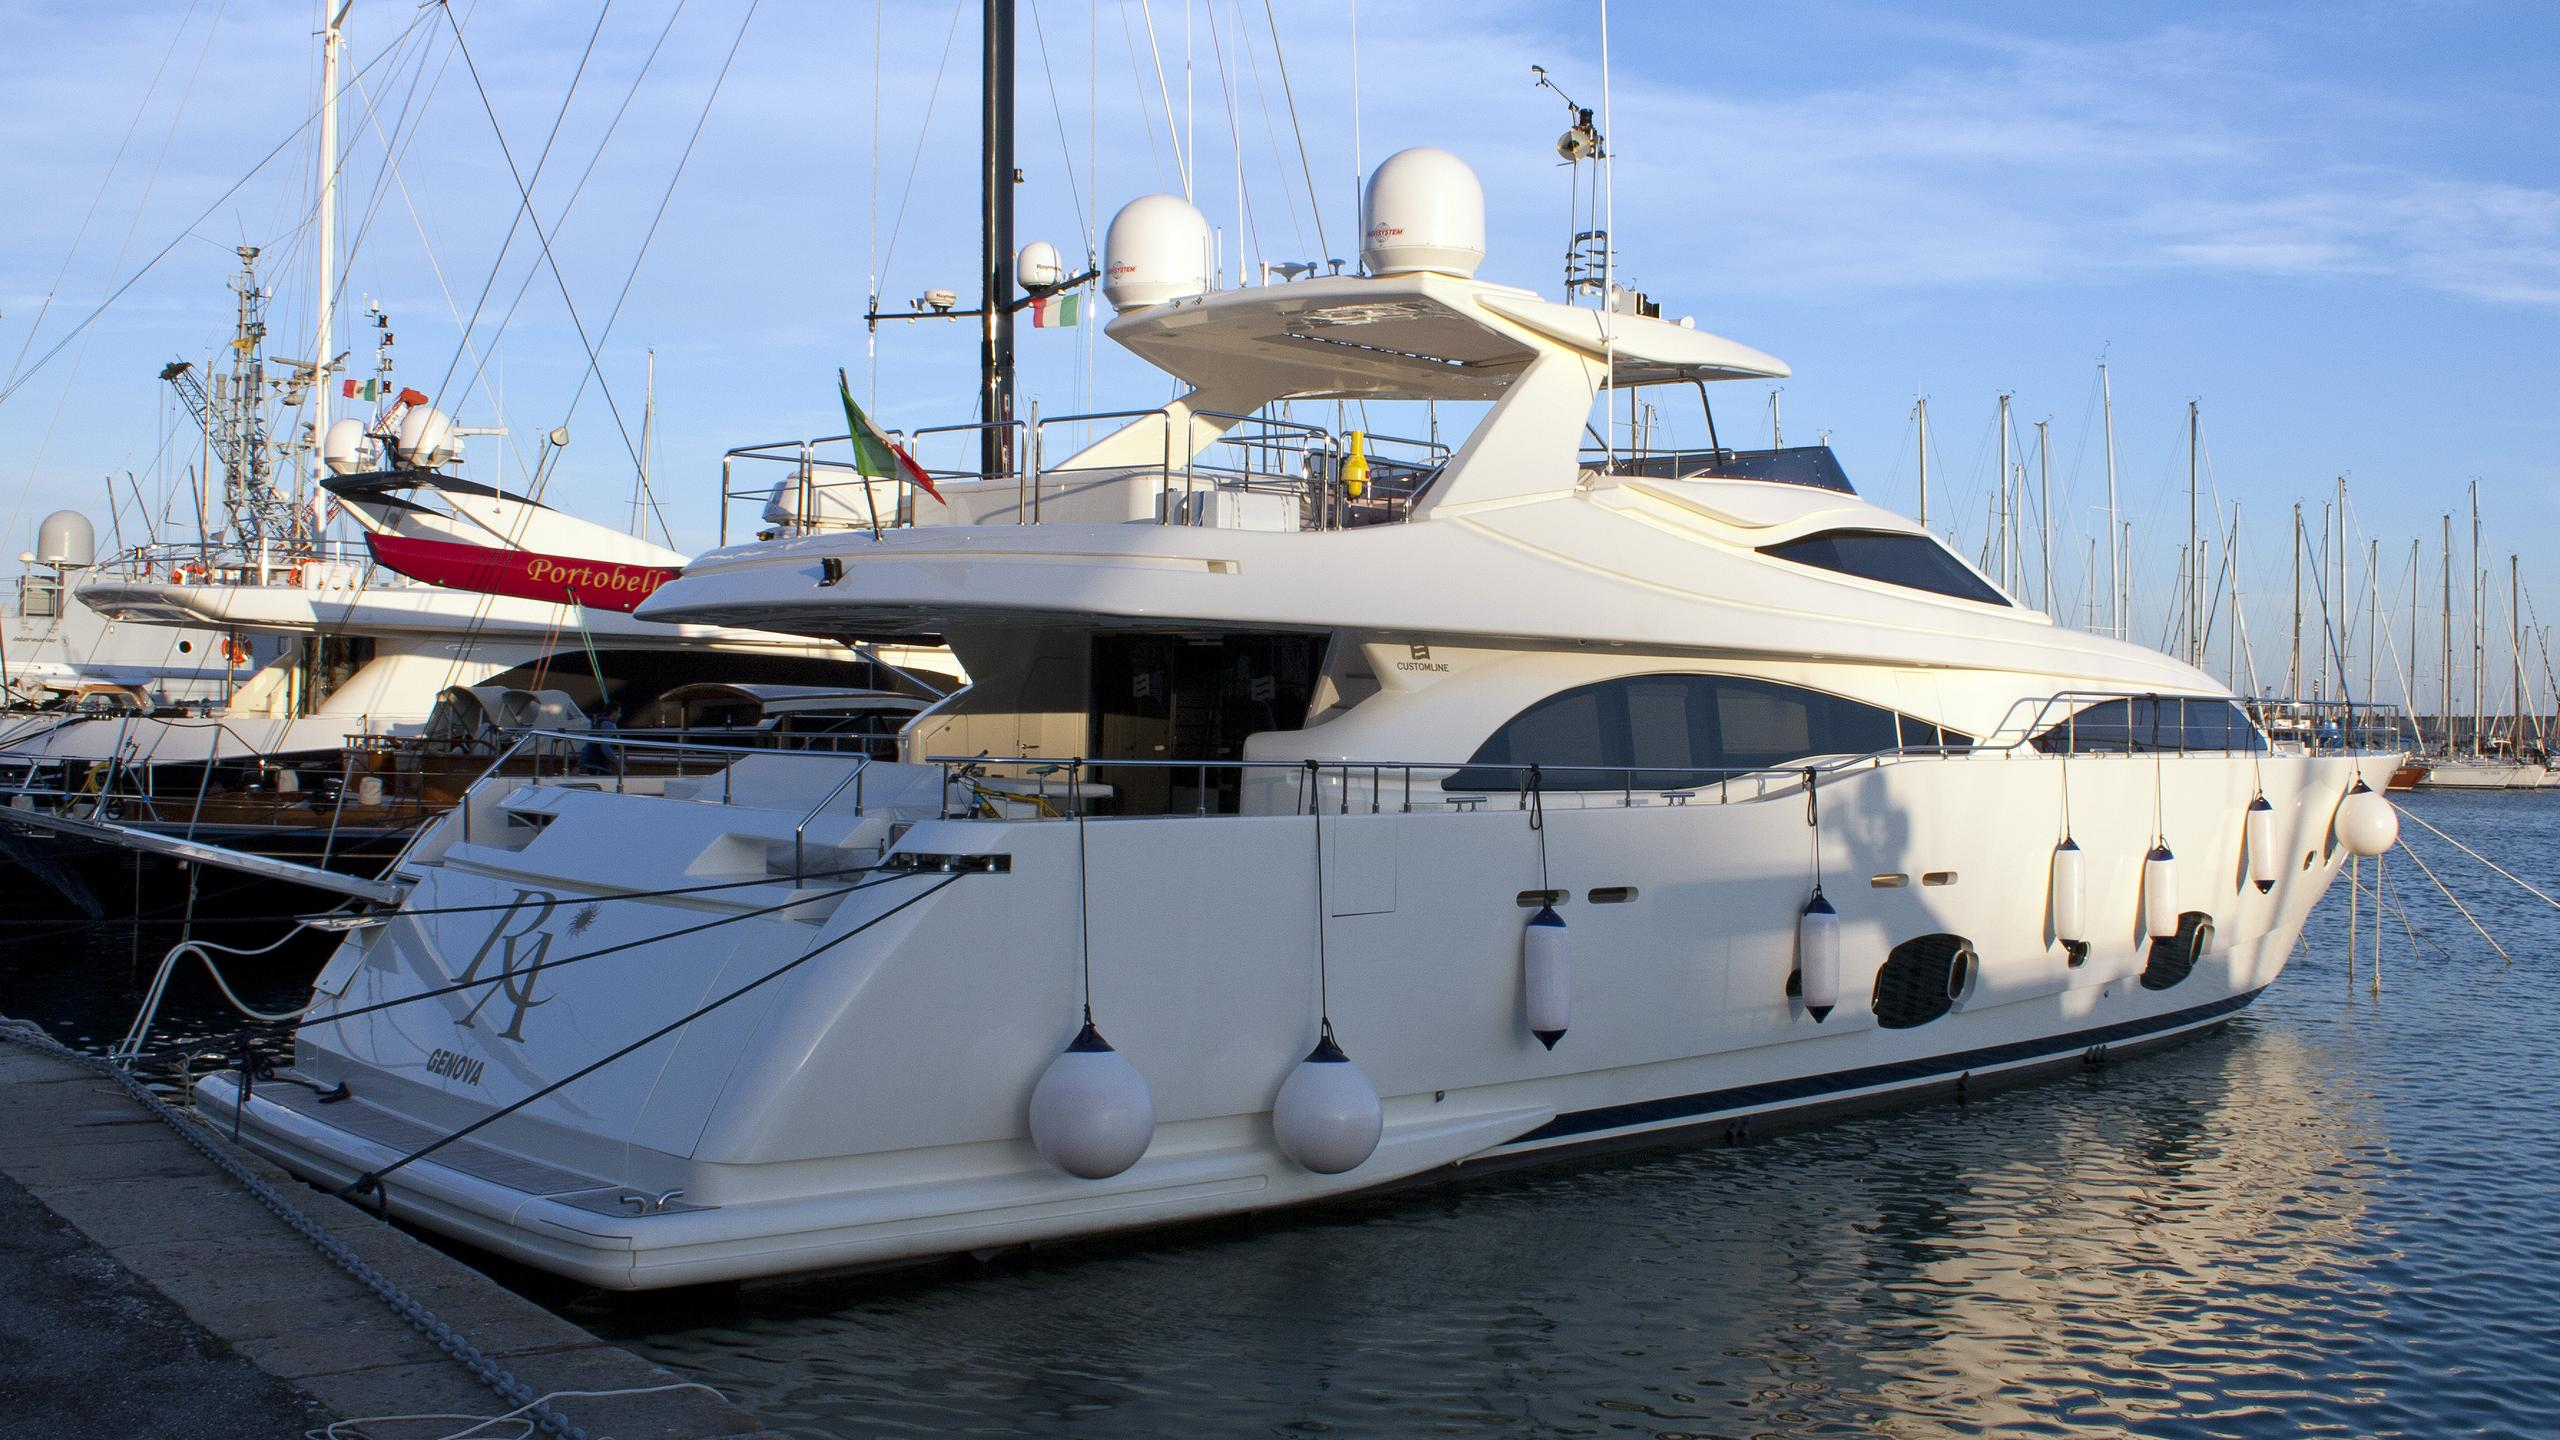 ra-motoryacht-ferretti-custom-line-97-2008-29m-stern-view